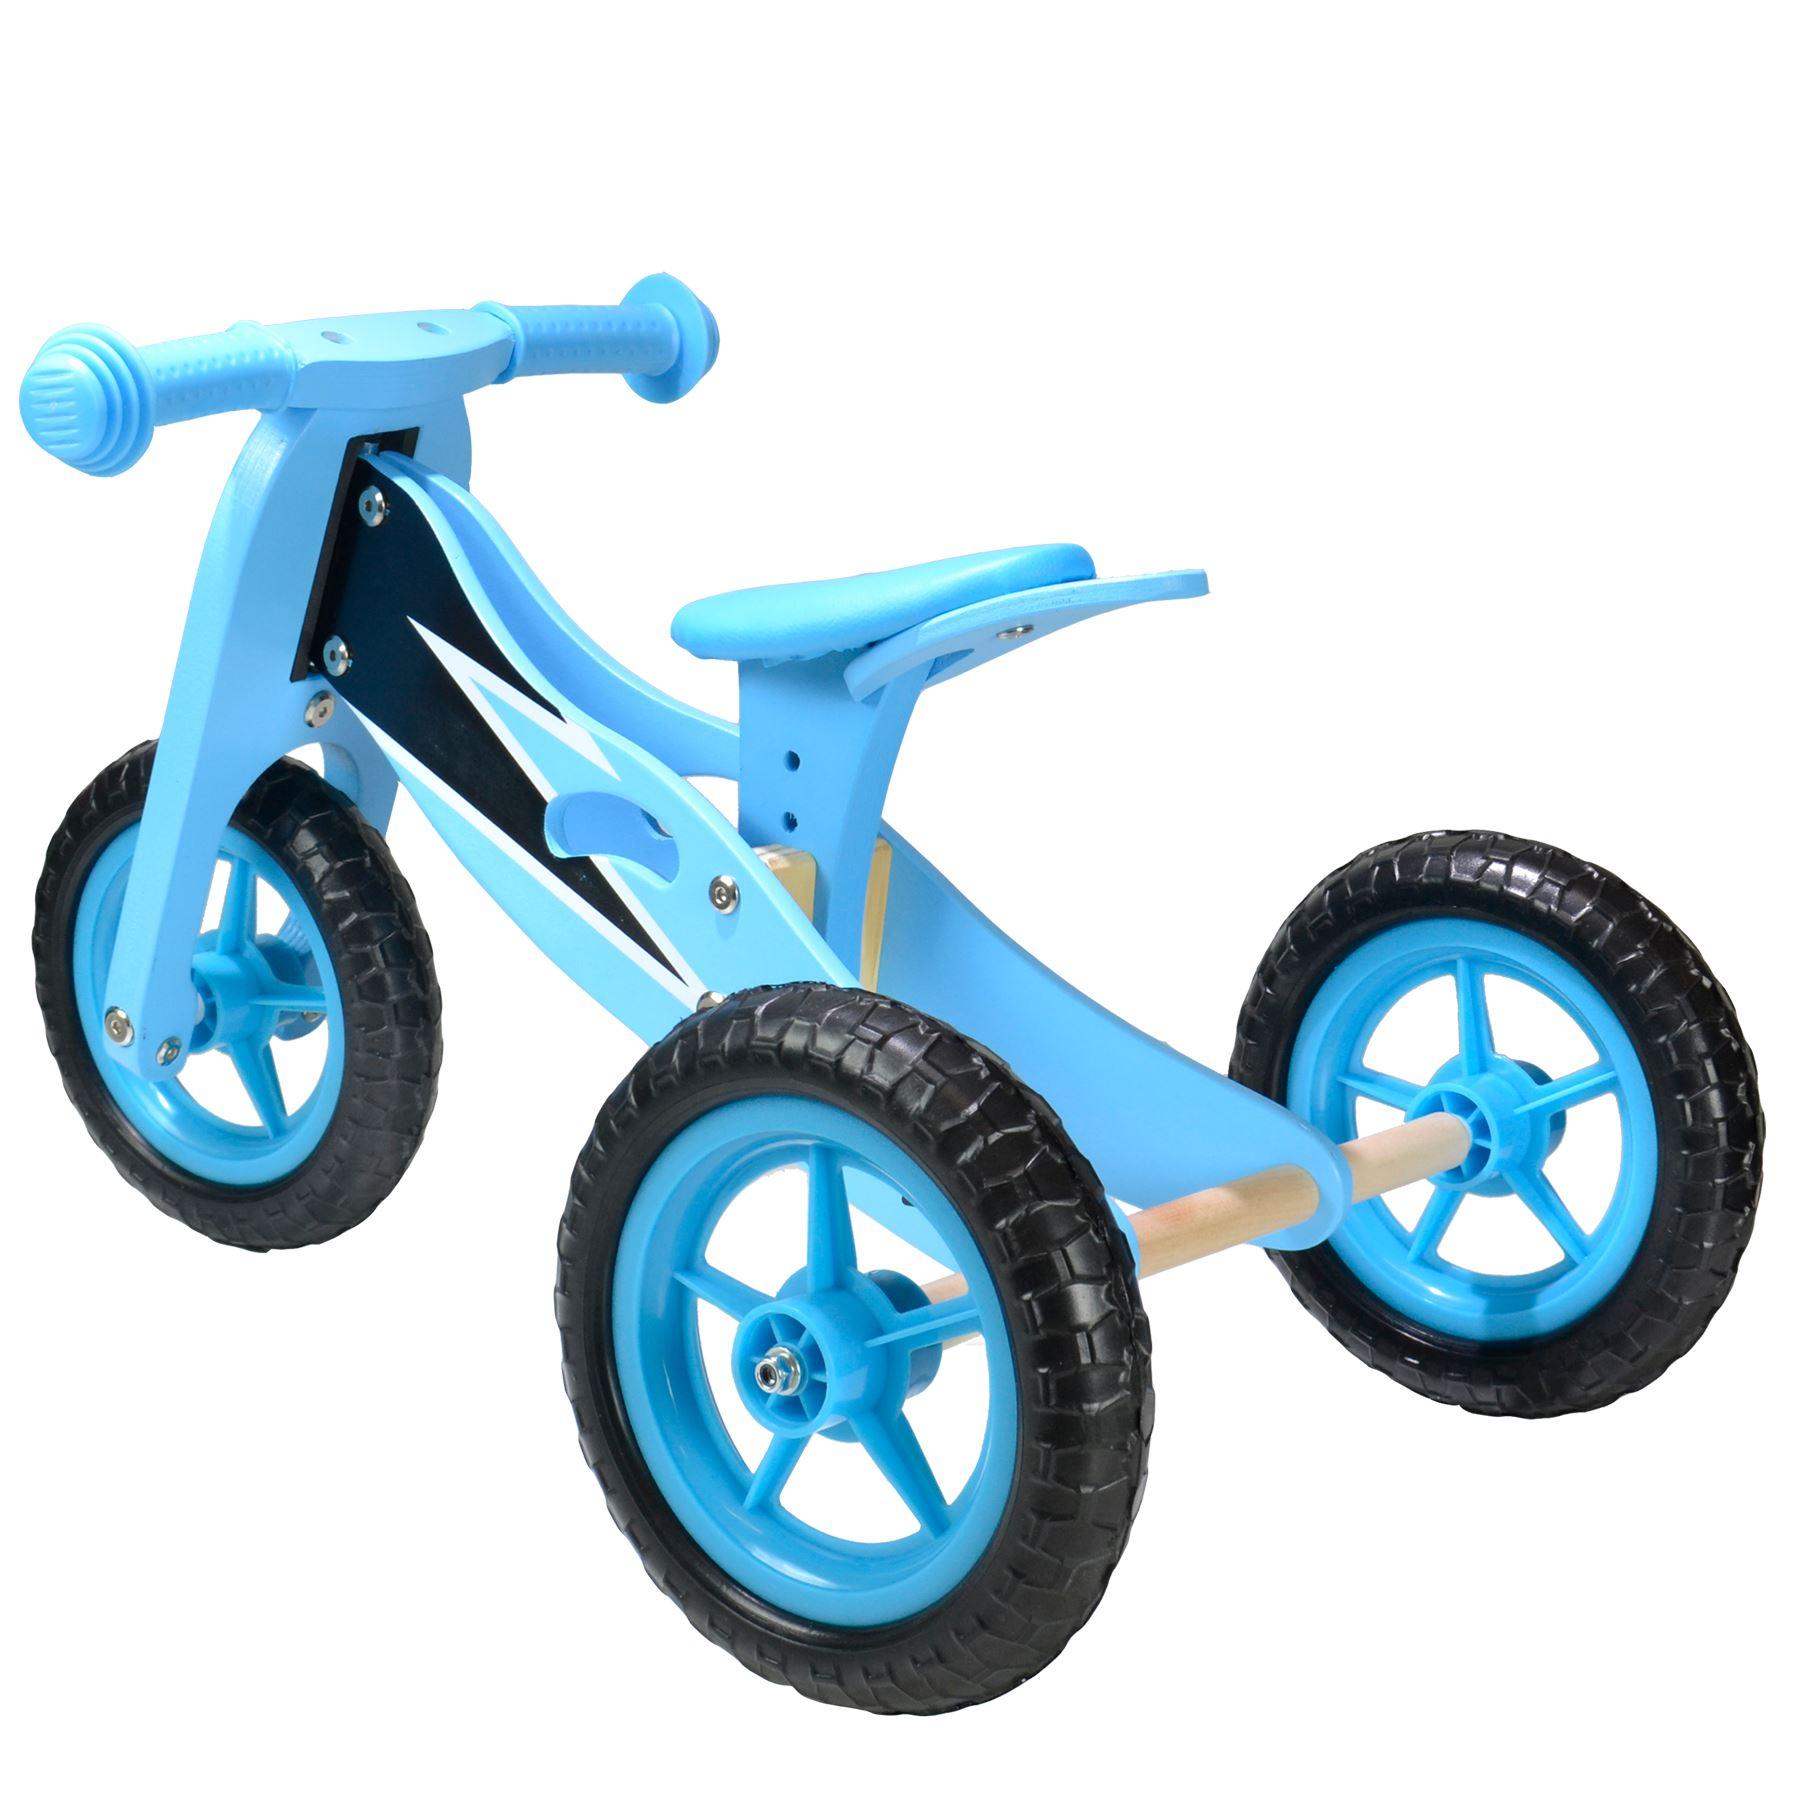 Details About Trike Bike Wooden Balance Training Toddler Kids Baby 2 In 1